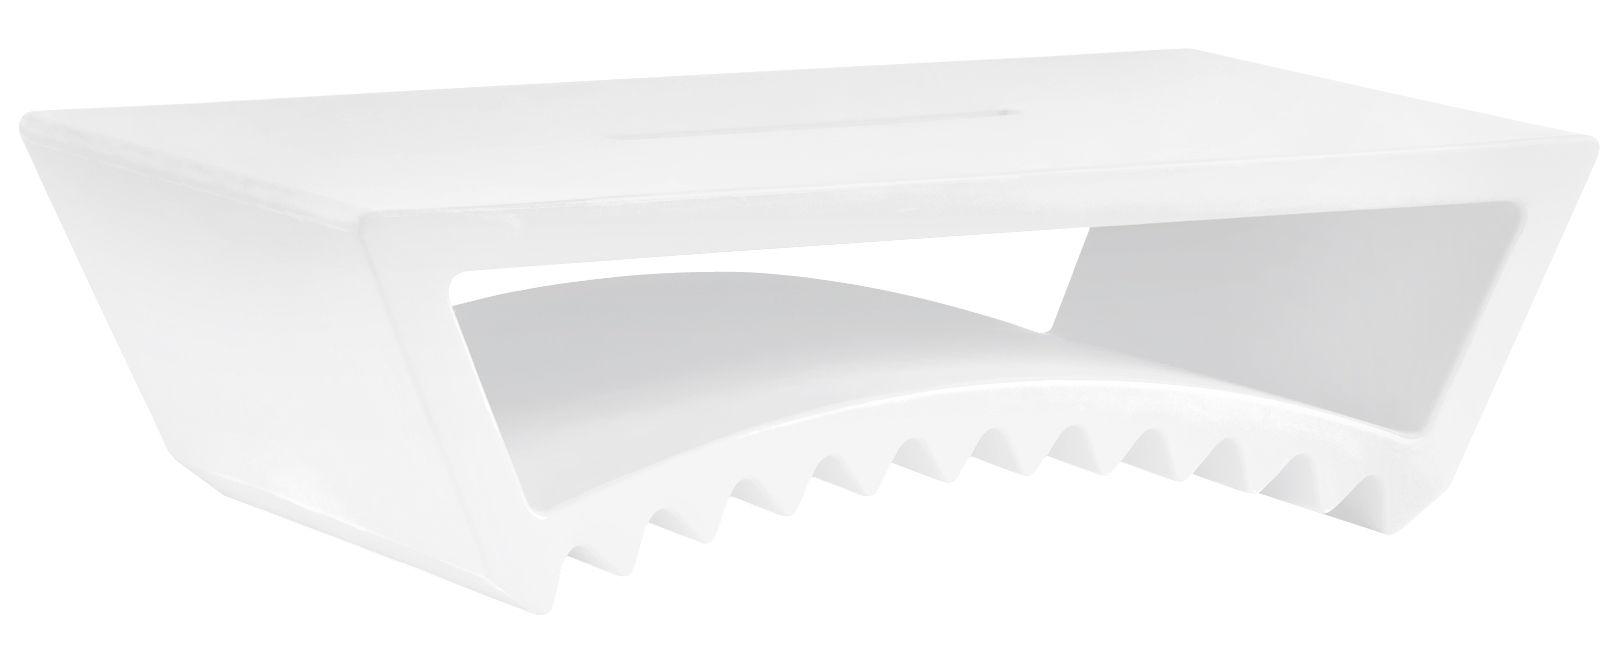 Arredamento - Tavolini  - Tavolino Tac - / 115 x 60 x H 33 cm di Slide - Bianco - polietilene riciclabile